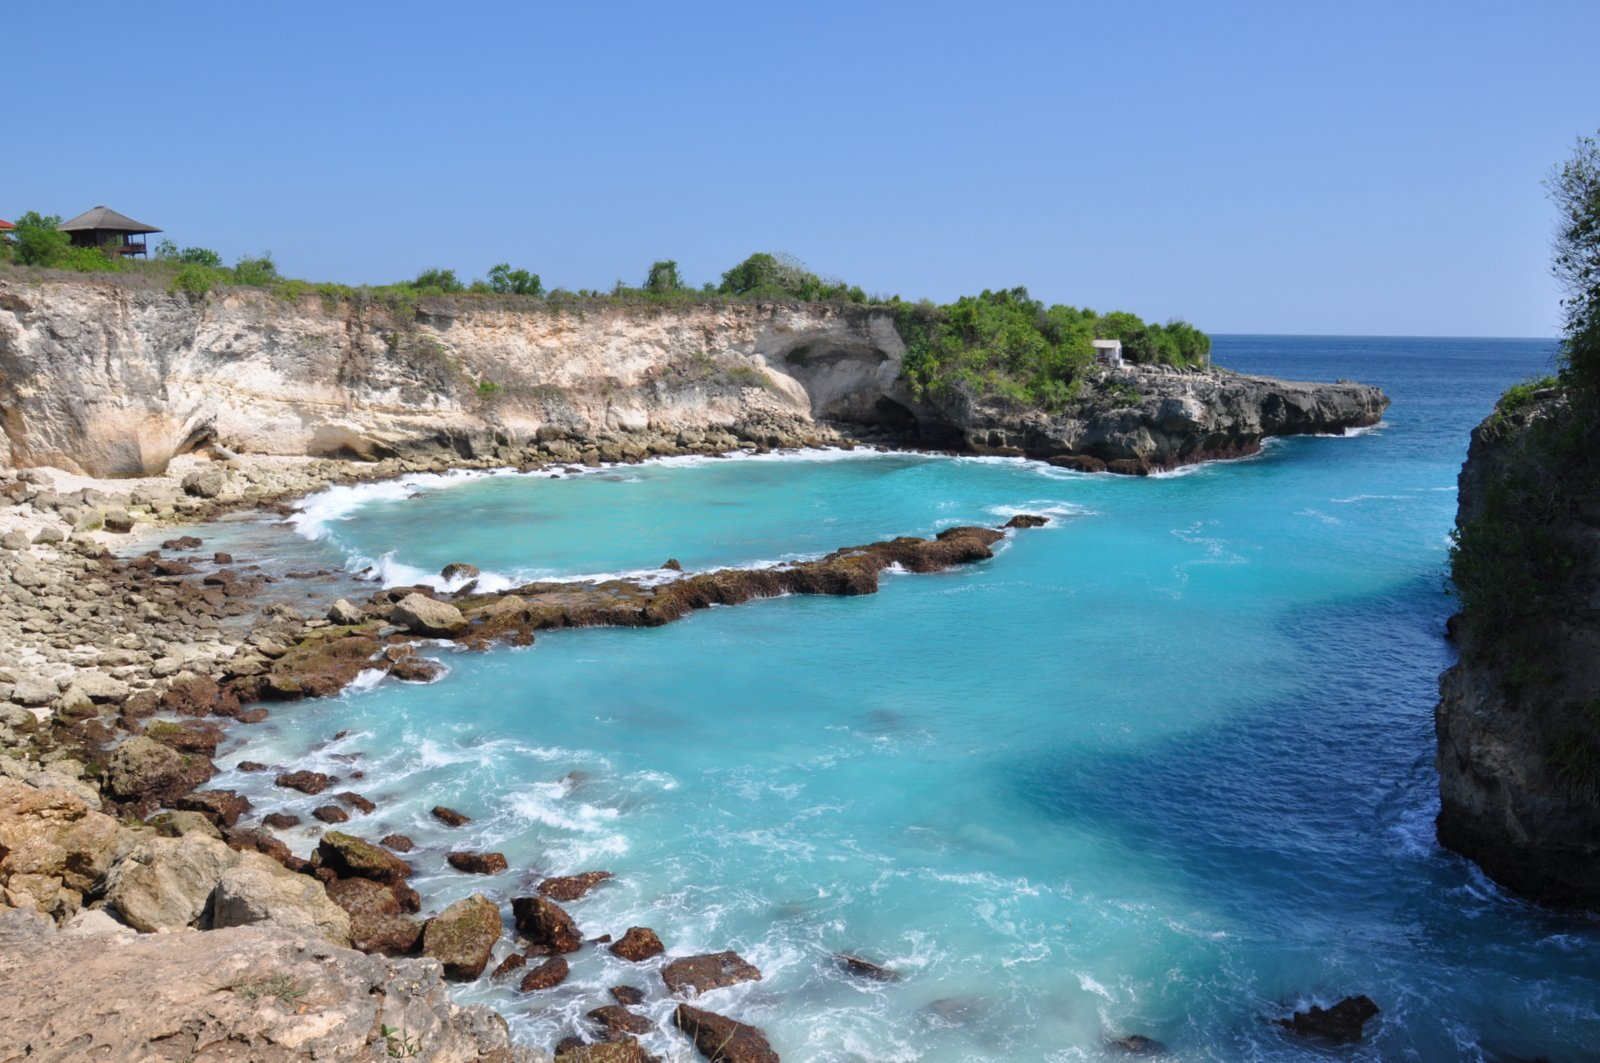 Le Blue Lagoon sur Nusa Ceningan